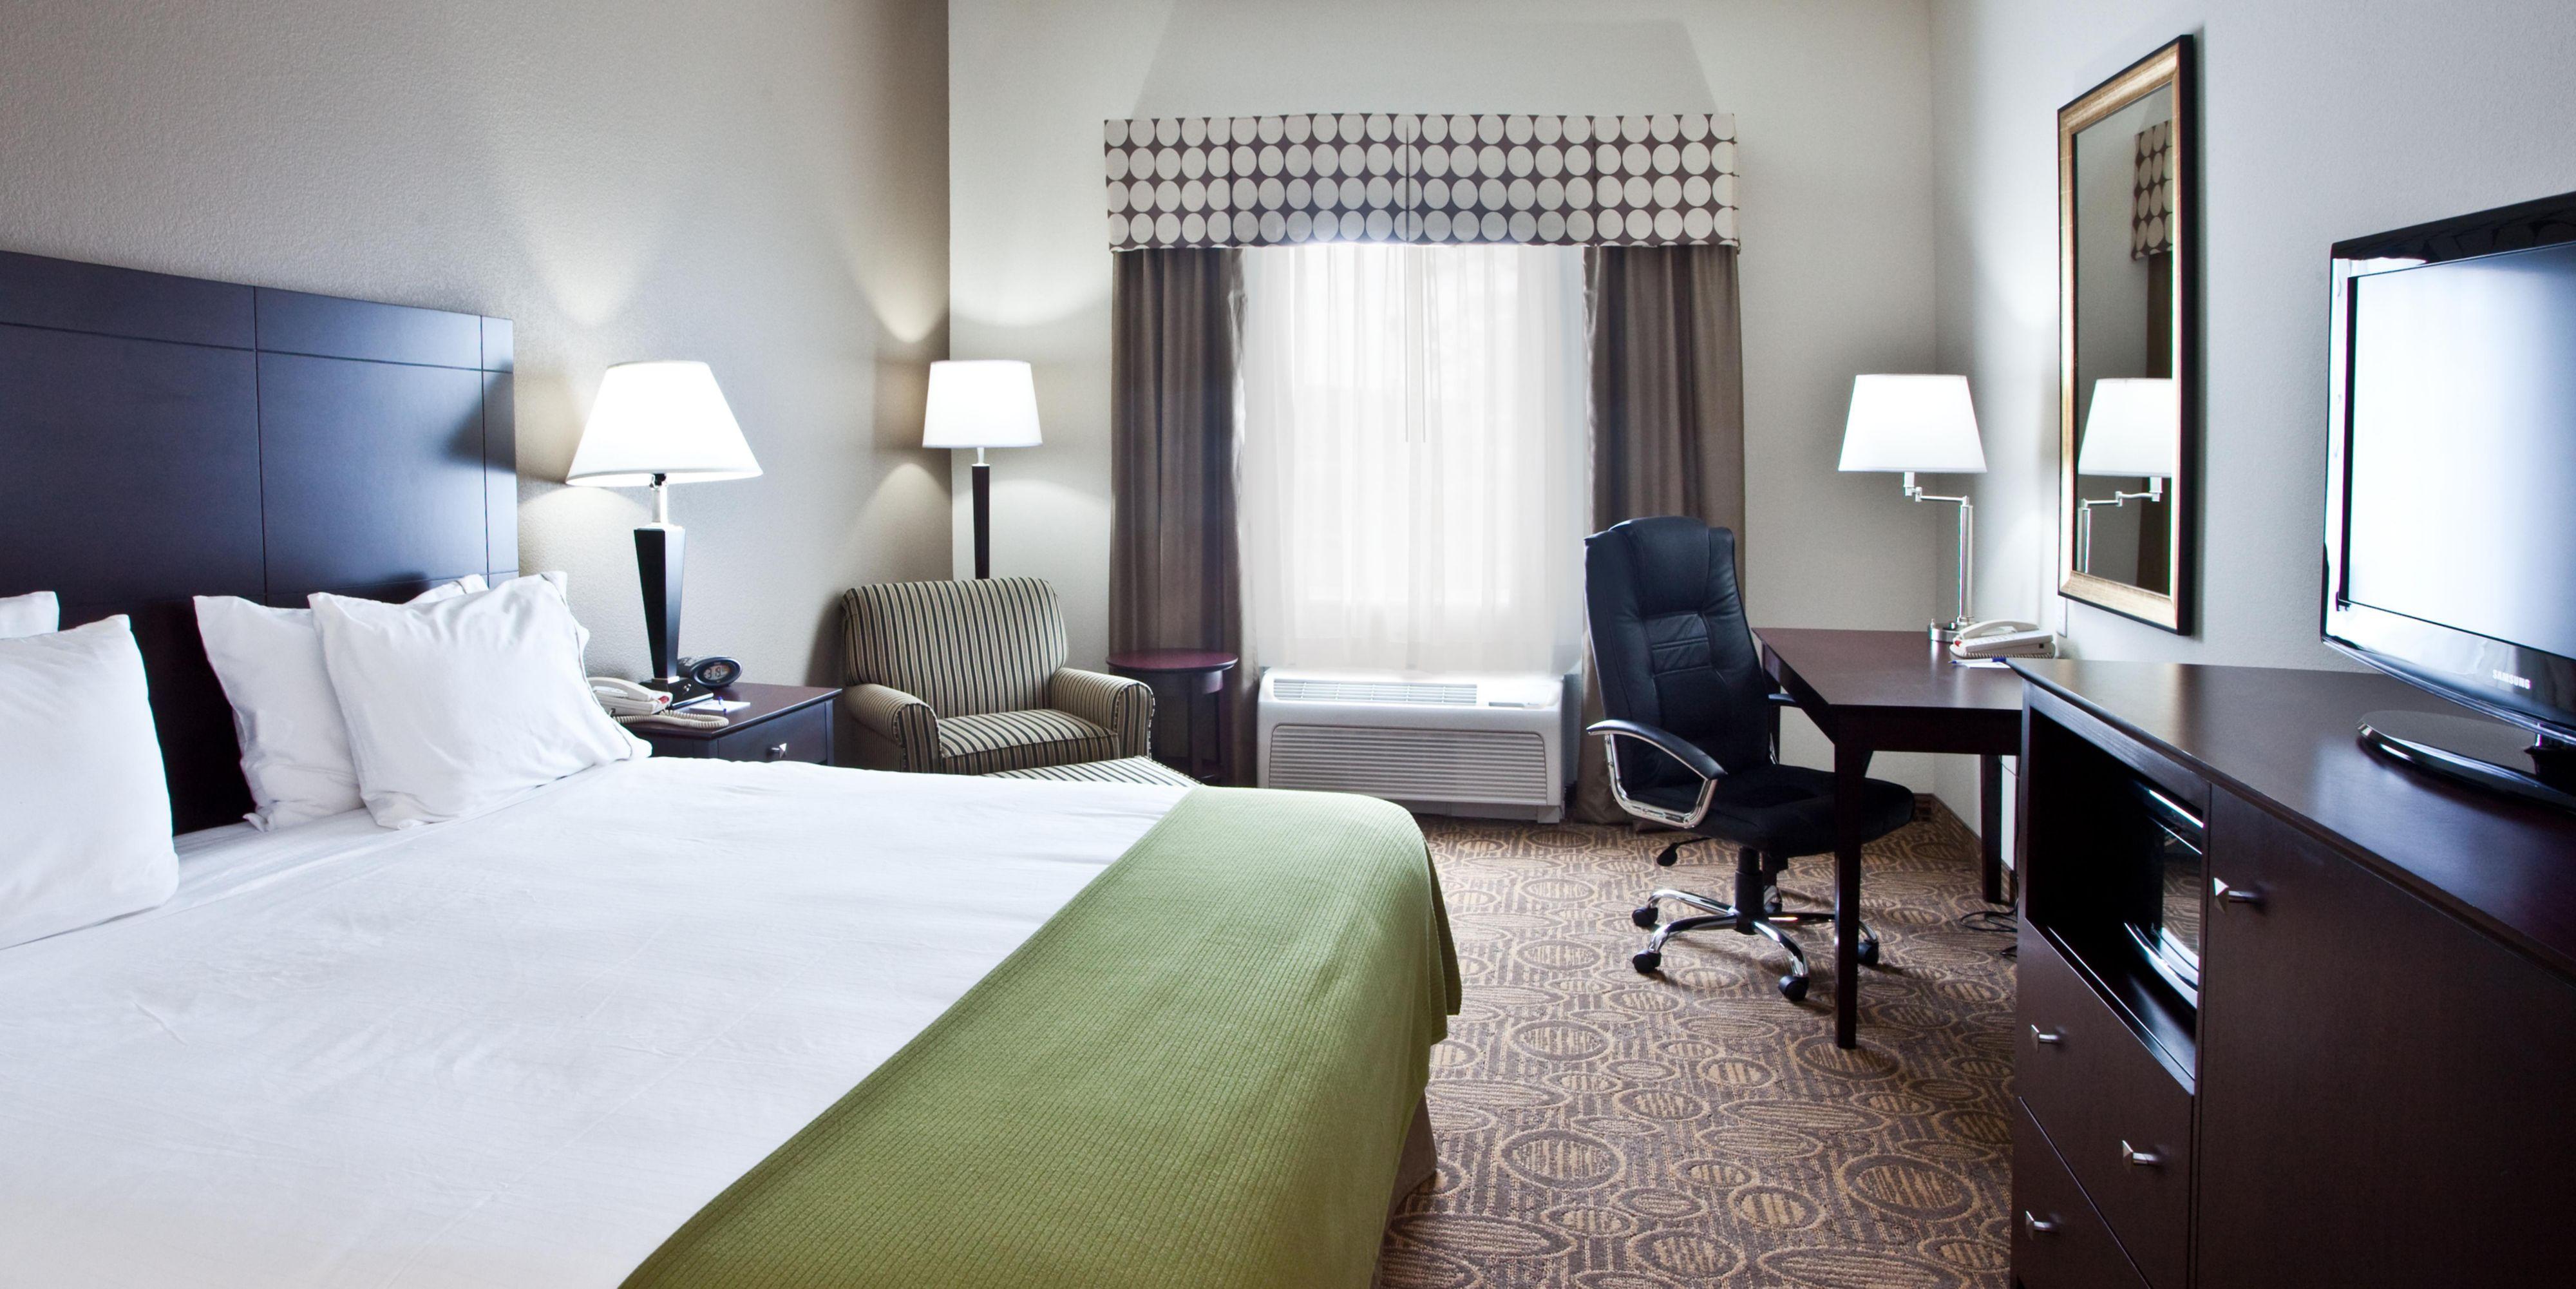 Holiday Inn Express & Suites Palatka Northwest Hotel by IHG